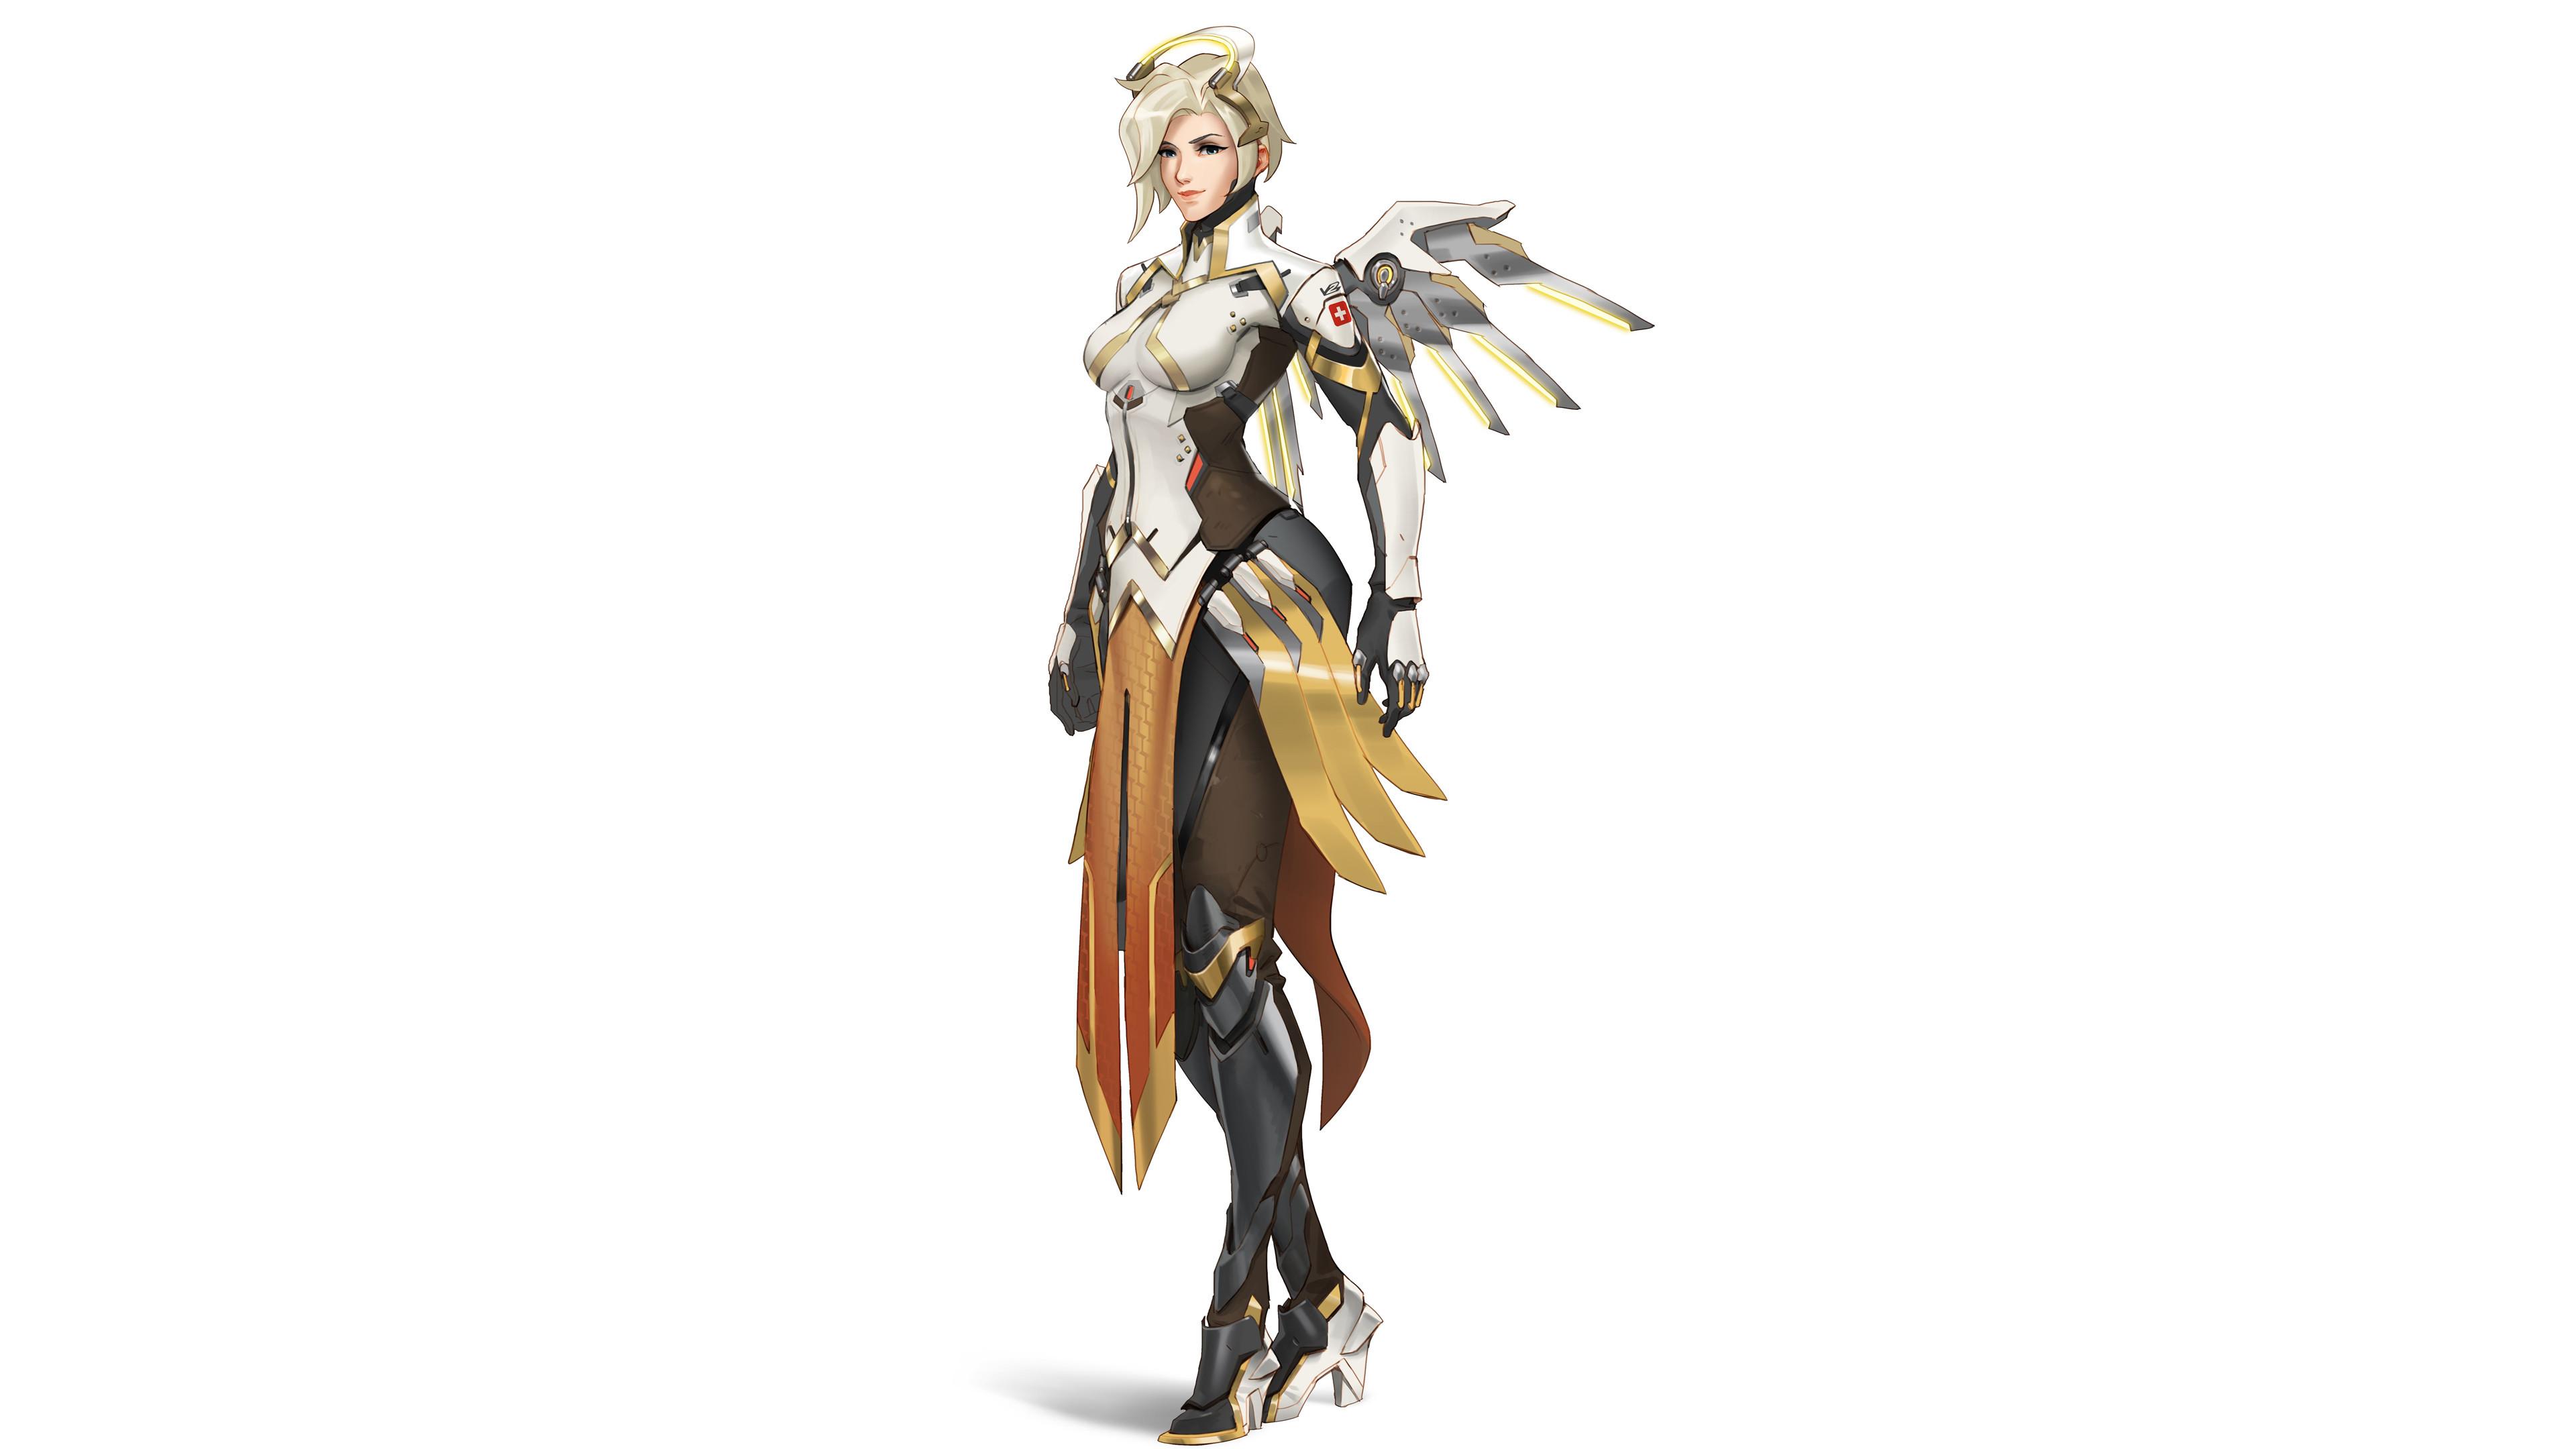 mercy overwatch 2 vg 3840x2160 1 - Mercy Overwatch 2 - Mercy Overwatch 4k wallpaper